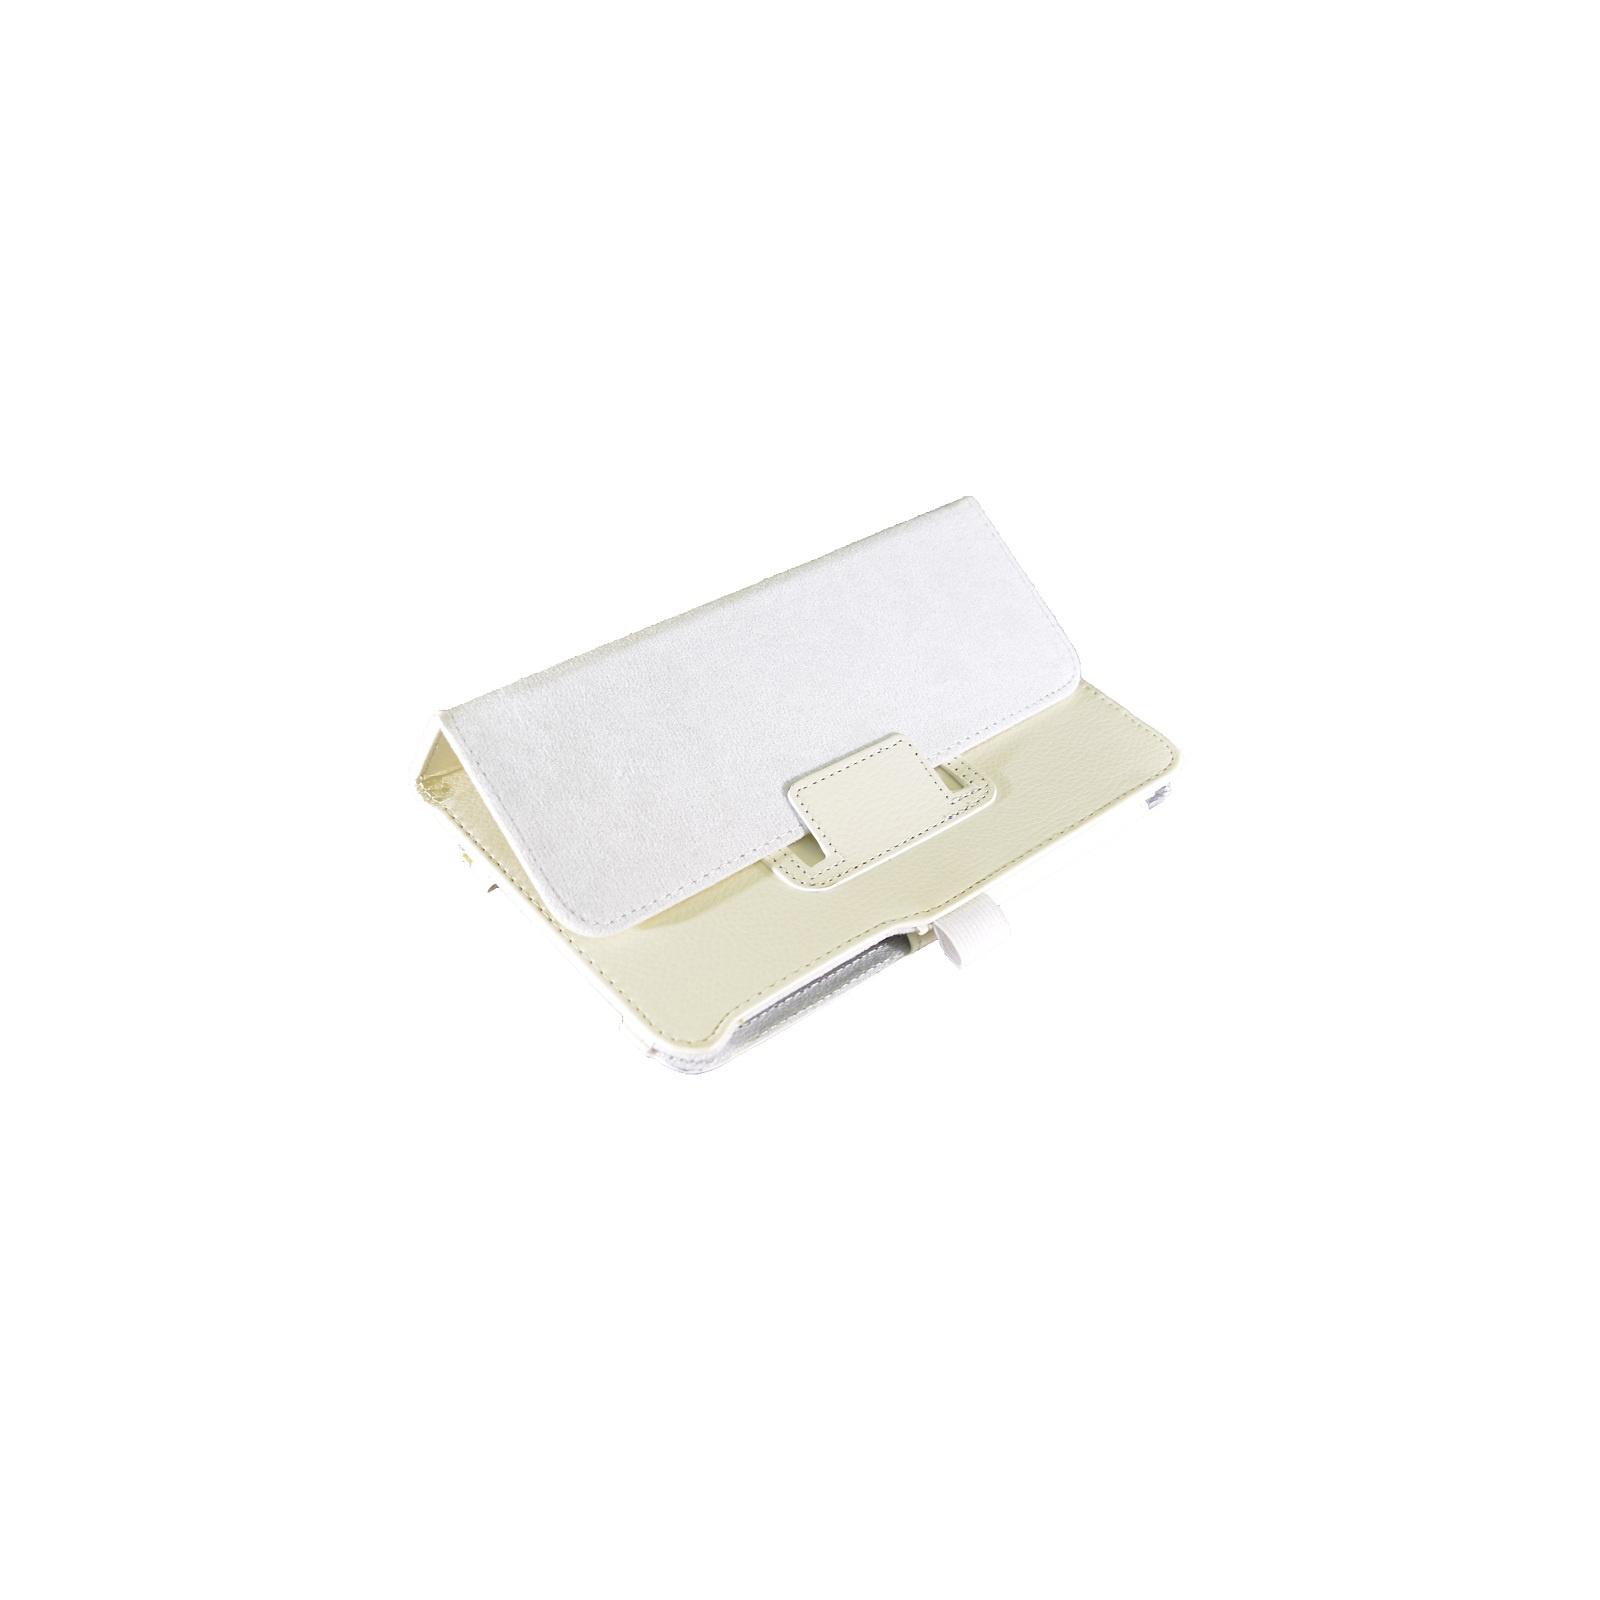 "Чехол для планшета Pro-case 7"" Pro-case Asus 7"" MeMO Pad ME170 white (ME170w) изображение 3"